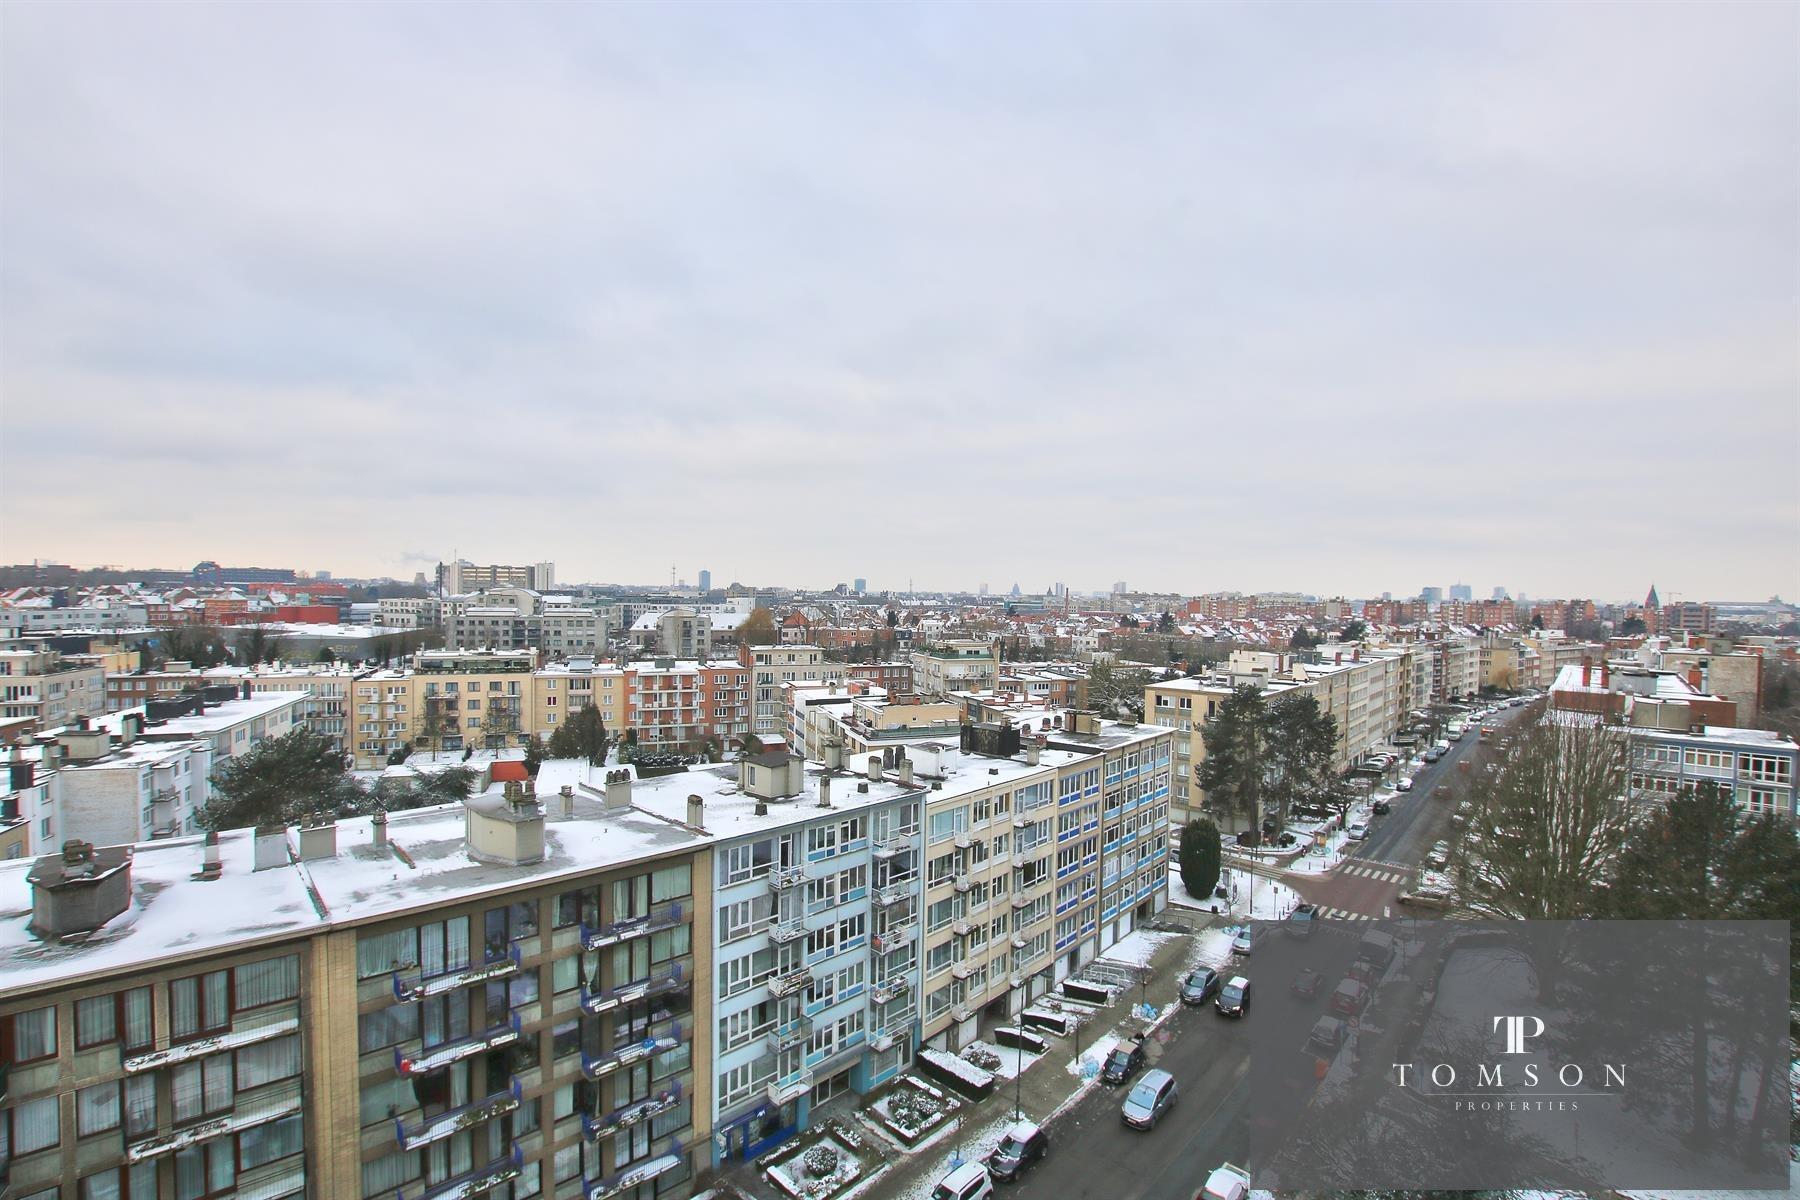 Flat - Woluwe-Saint-Pierre - #4296624-10